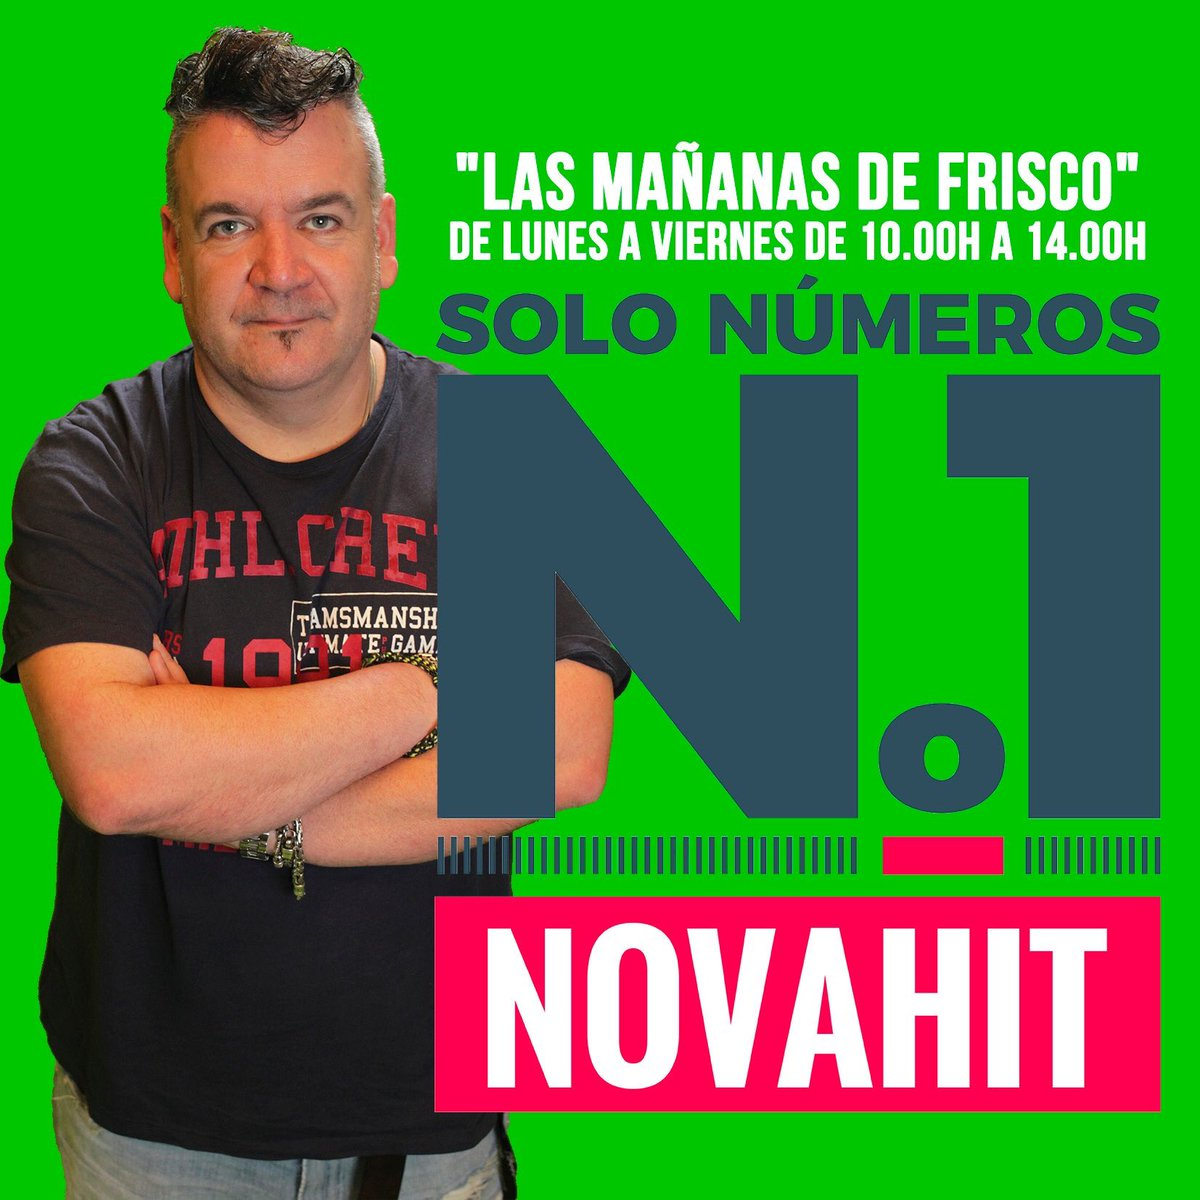 Esta mañana en @NovaHit_ @REYKON @Residente @ReikMx @soyRayden @SFDKoficial @PrinceRoyce @pedrocapo @LadyGagaSpain @DuaLipaESP @donpatricio_ofi @palomamamicl @pabloalboran @PabloLopezMusic @LOQUILLOoficial @HombresG @manaoficial @natalialacunza @monlaferte os esperan https://t.co/js8dFaxcAp